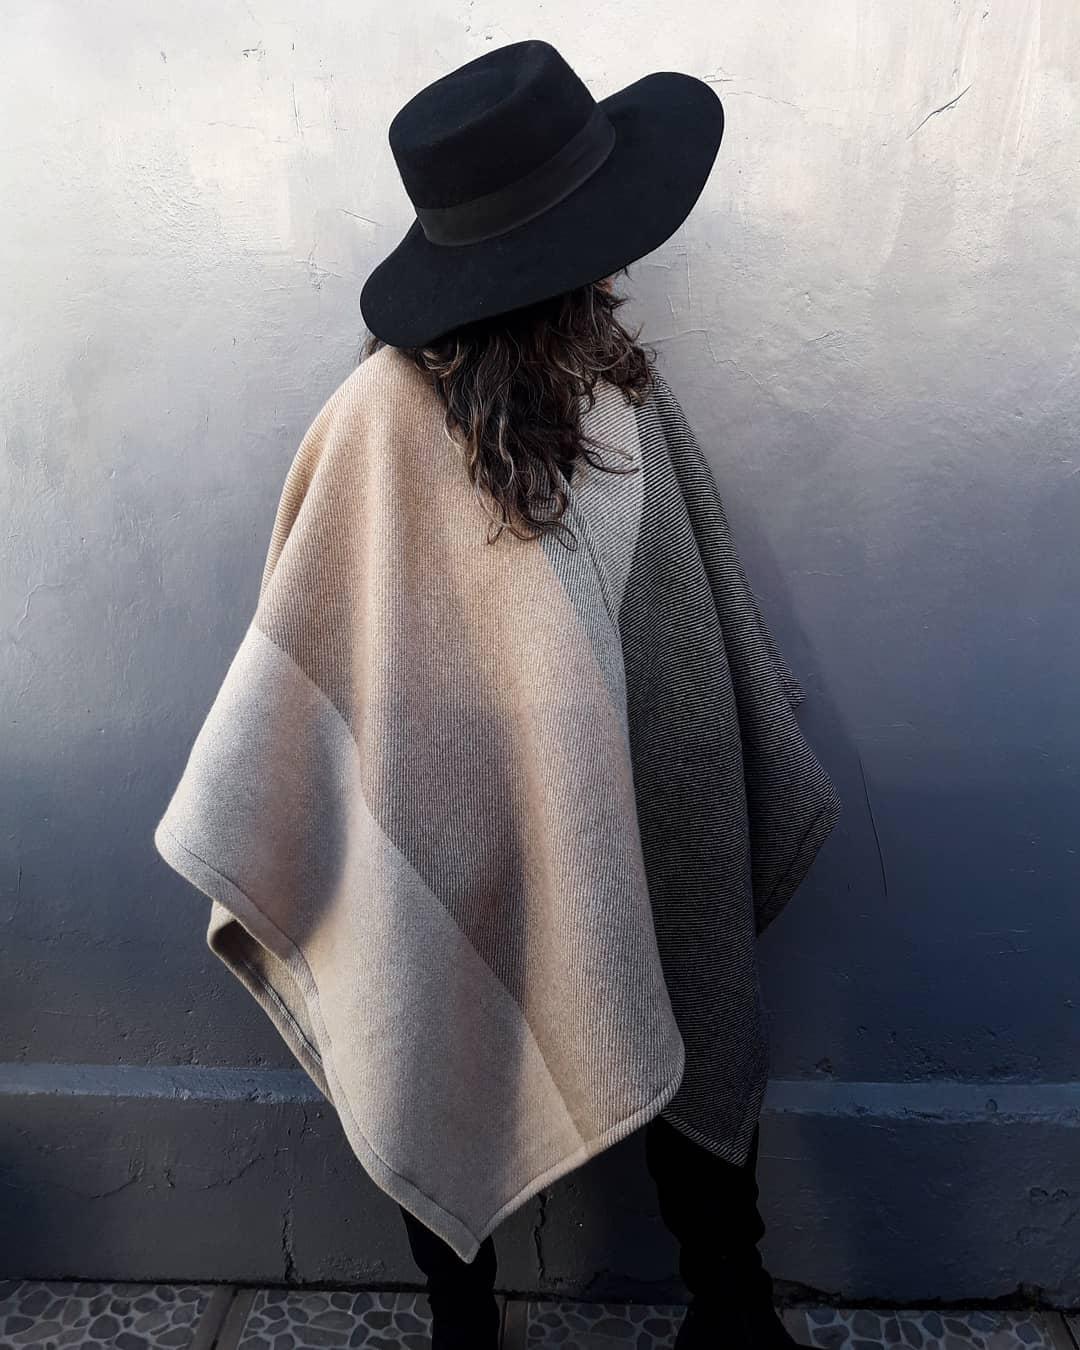 En la foto ruana de lana gruesa en tonos grises y rosas